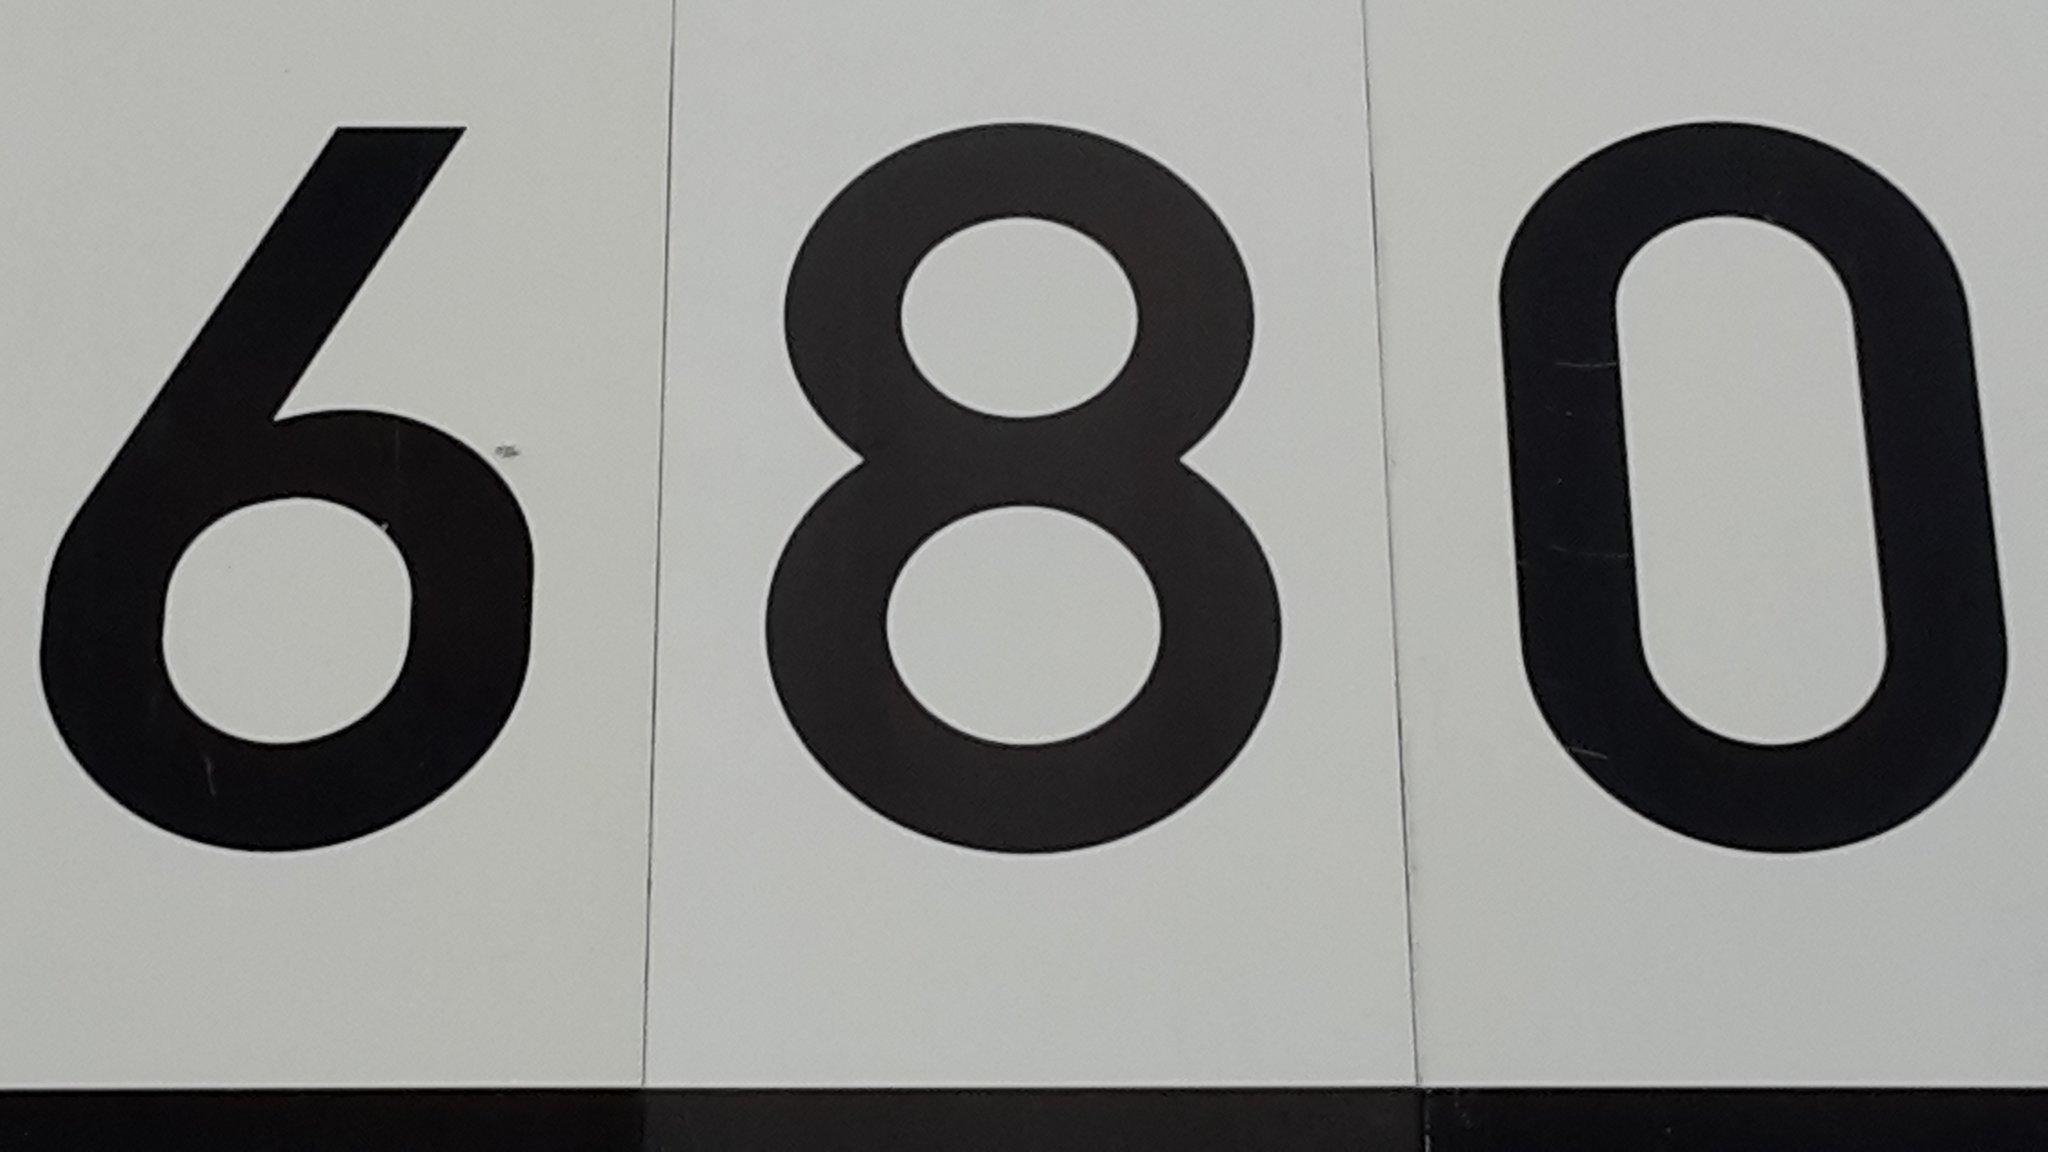 rheinkilometer-680